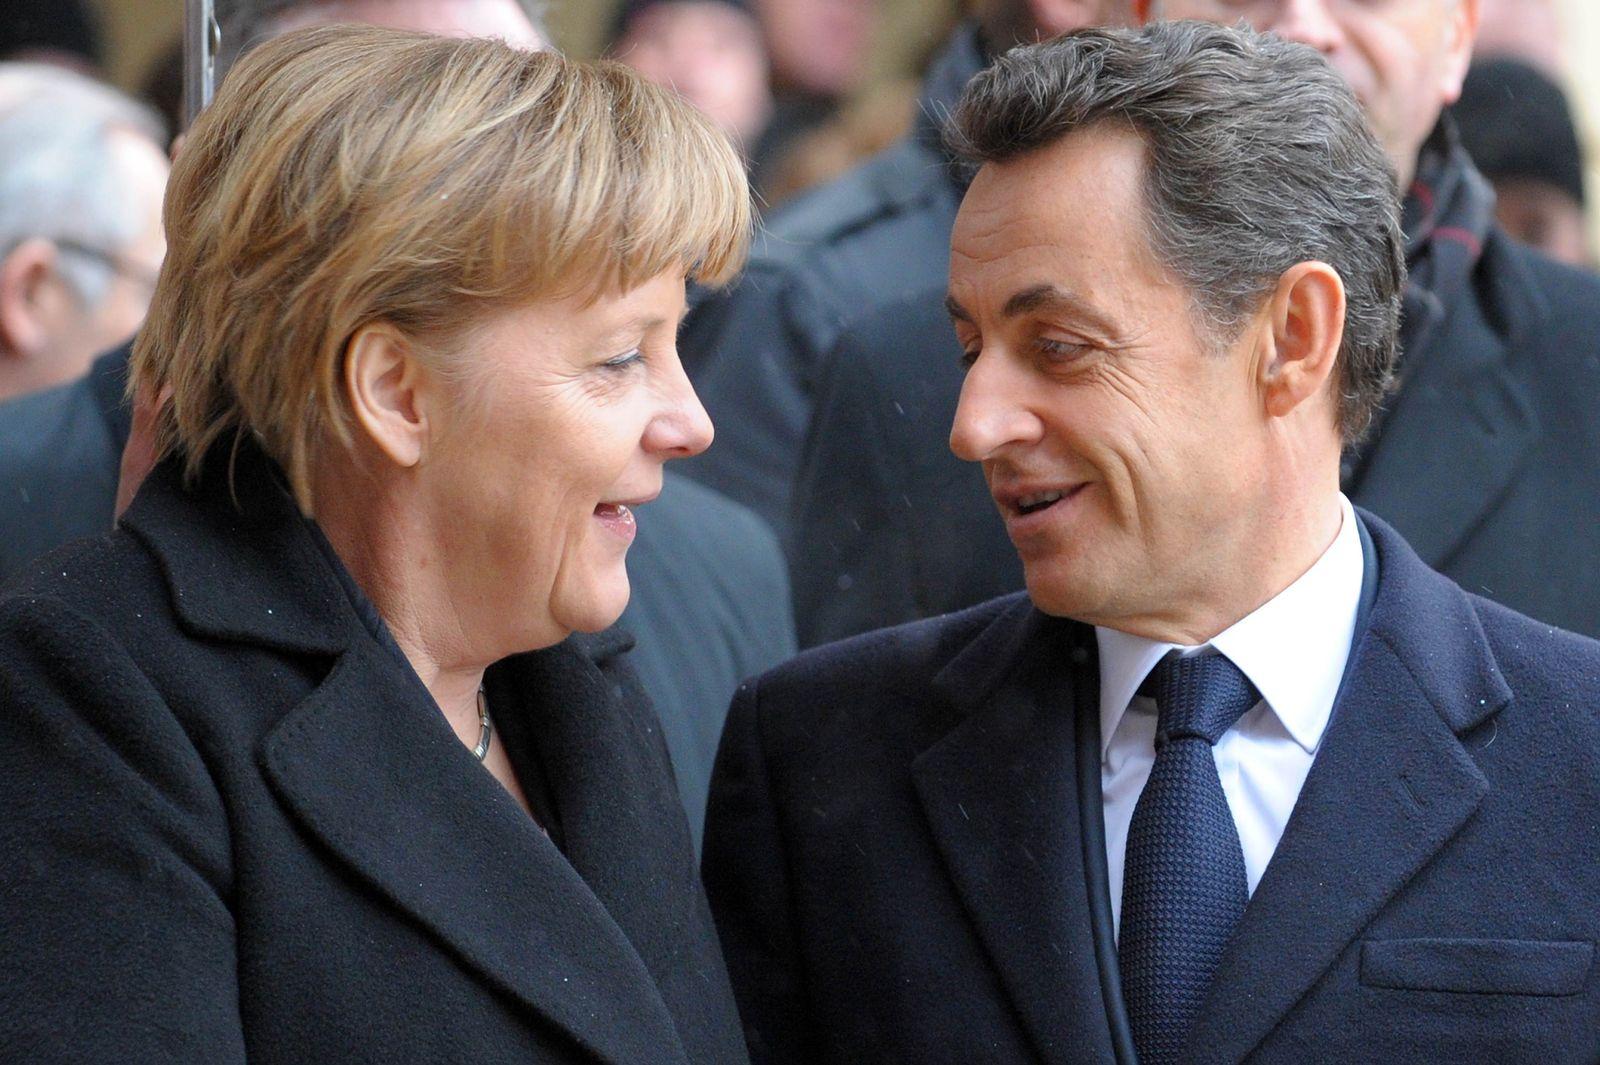 GERMANY-FRANCE-EU-EUROZONE-COUNCIL-MINISTERS